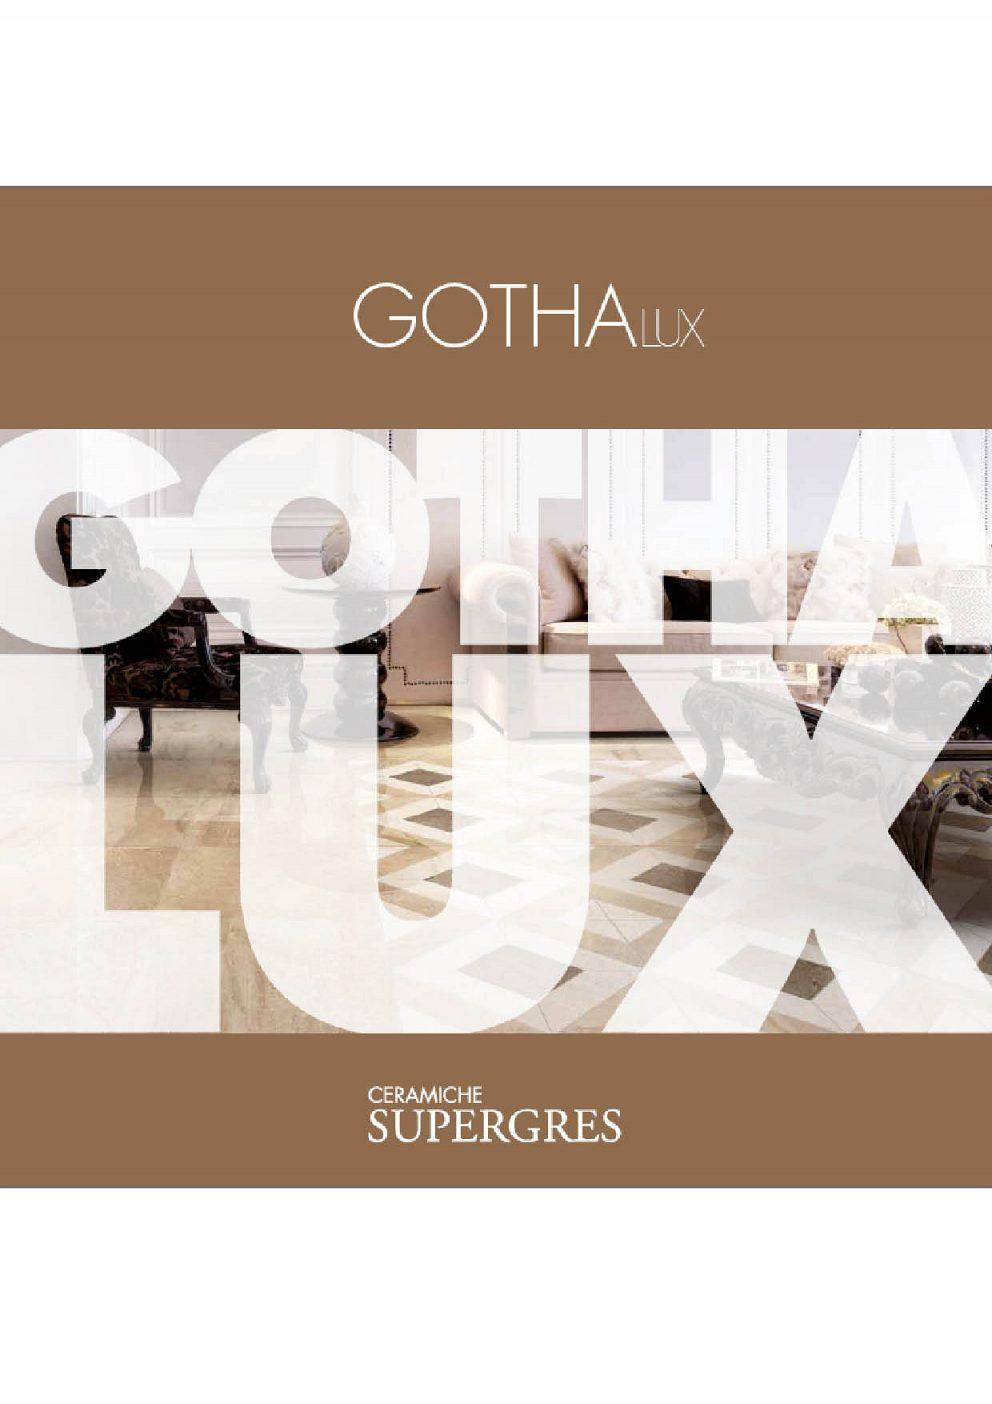 Supergres - Gotha Lux